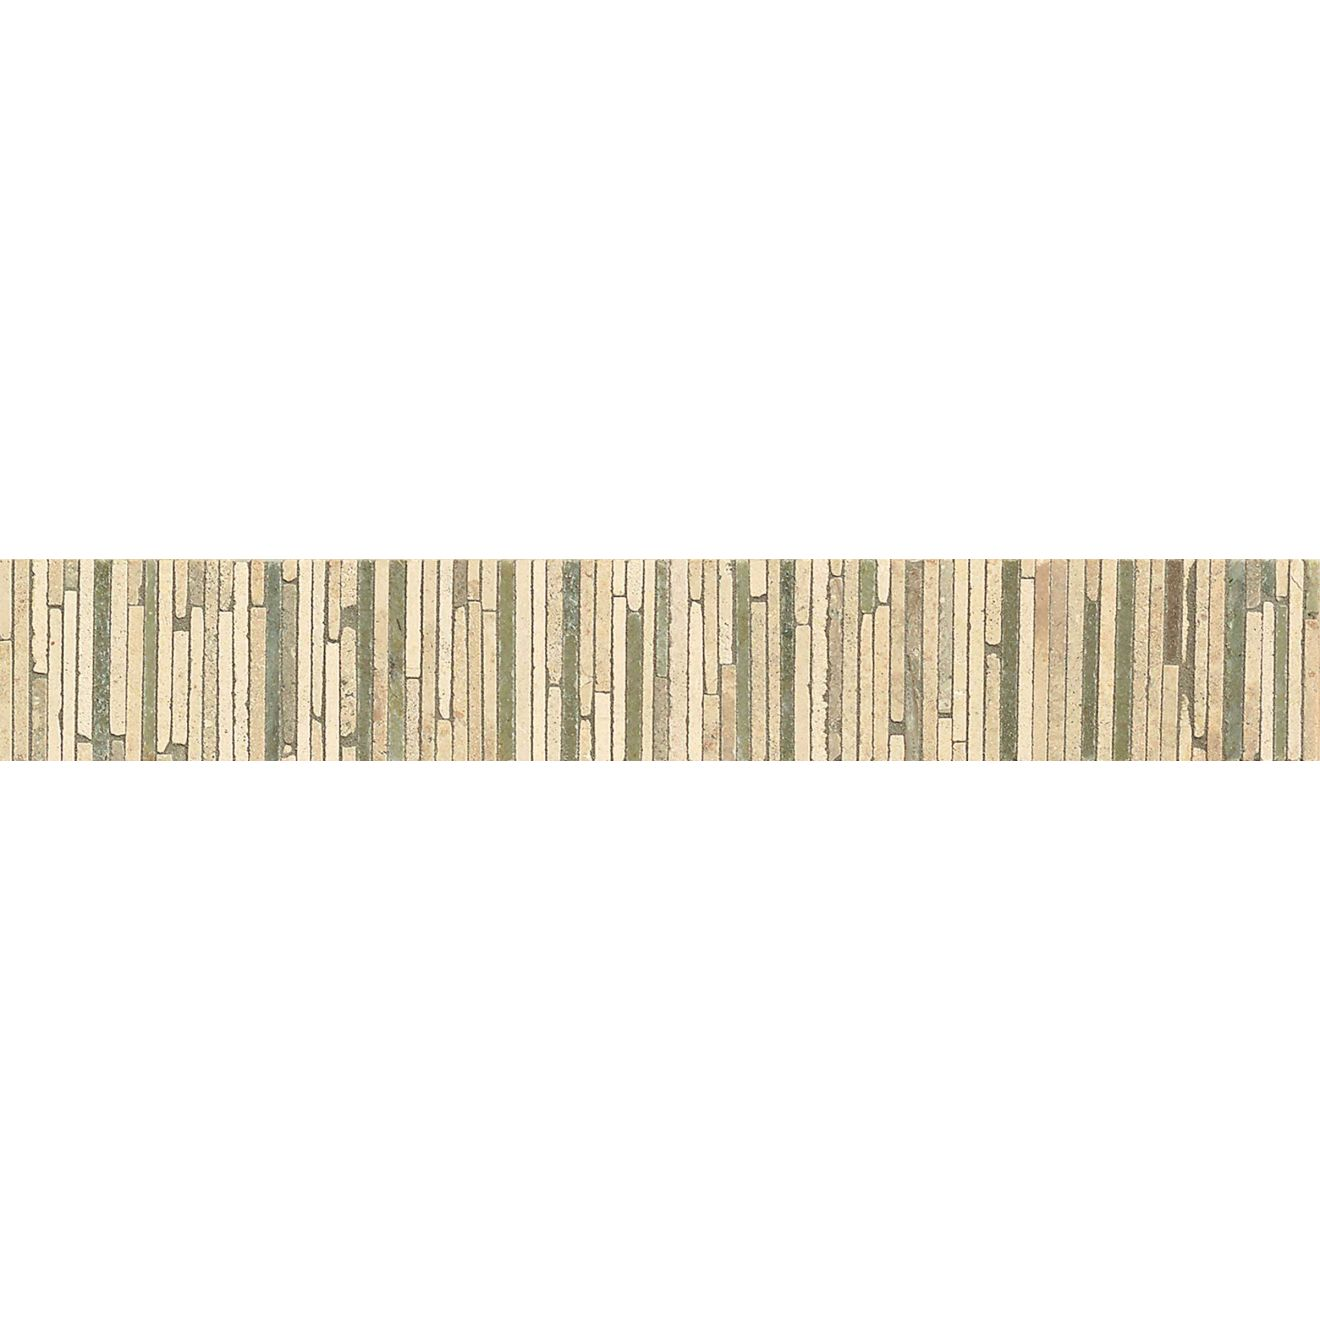 "Menage et Trois 2"" x 11.75"" Floor & Wall Listello in Crema, Tepenade, Verde Laguna"